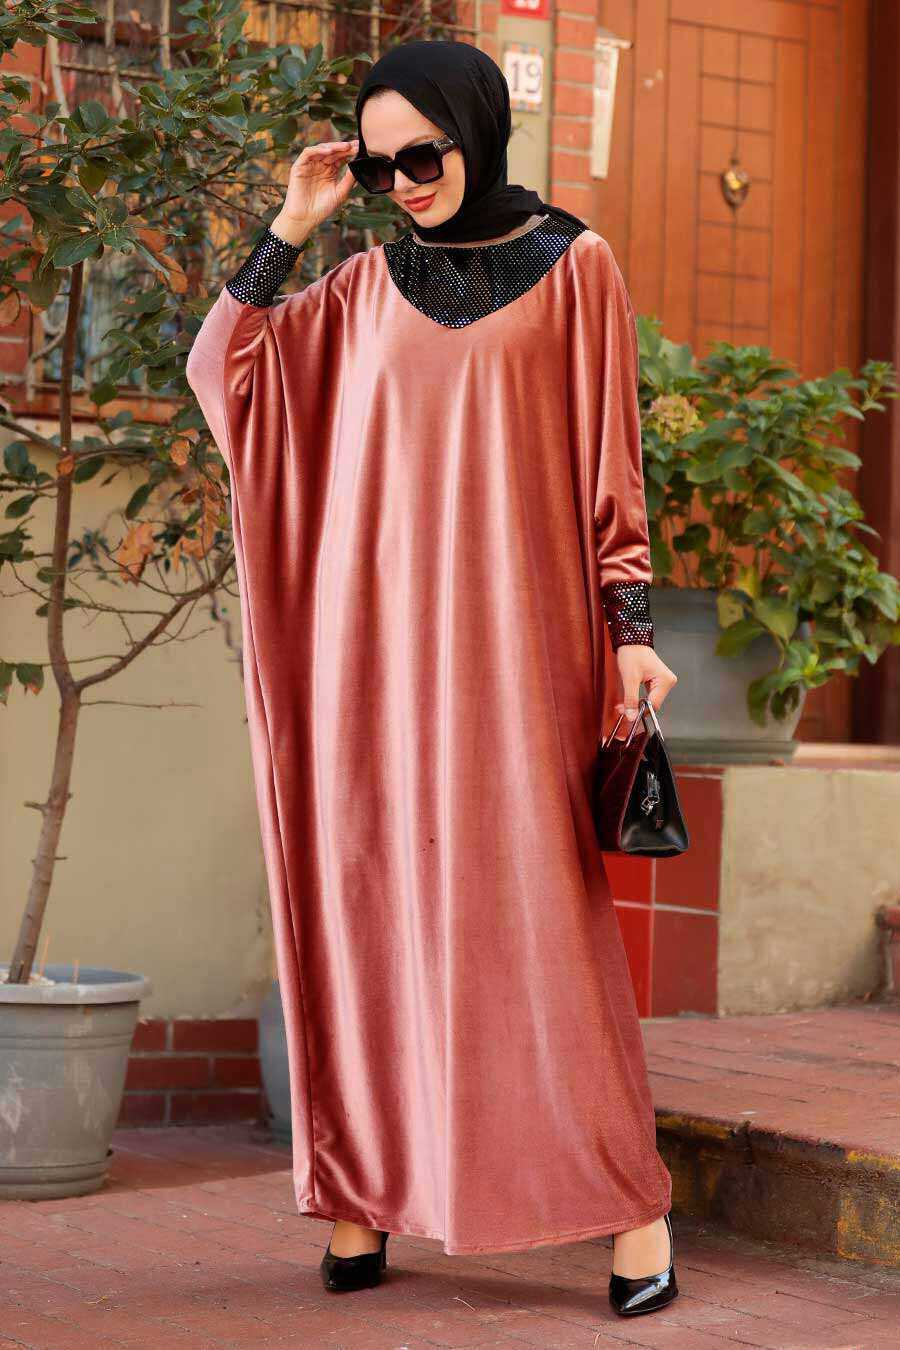 Dusty Rose Hijab Dress 10561GK